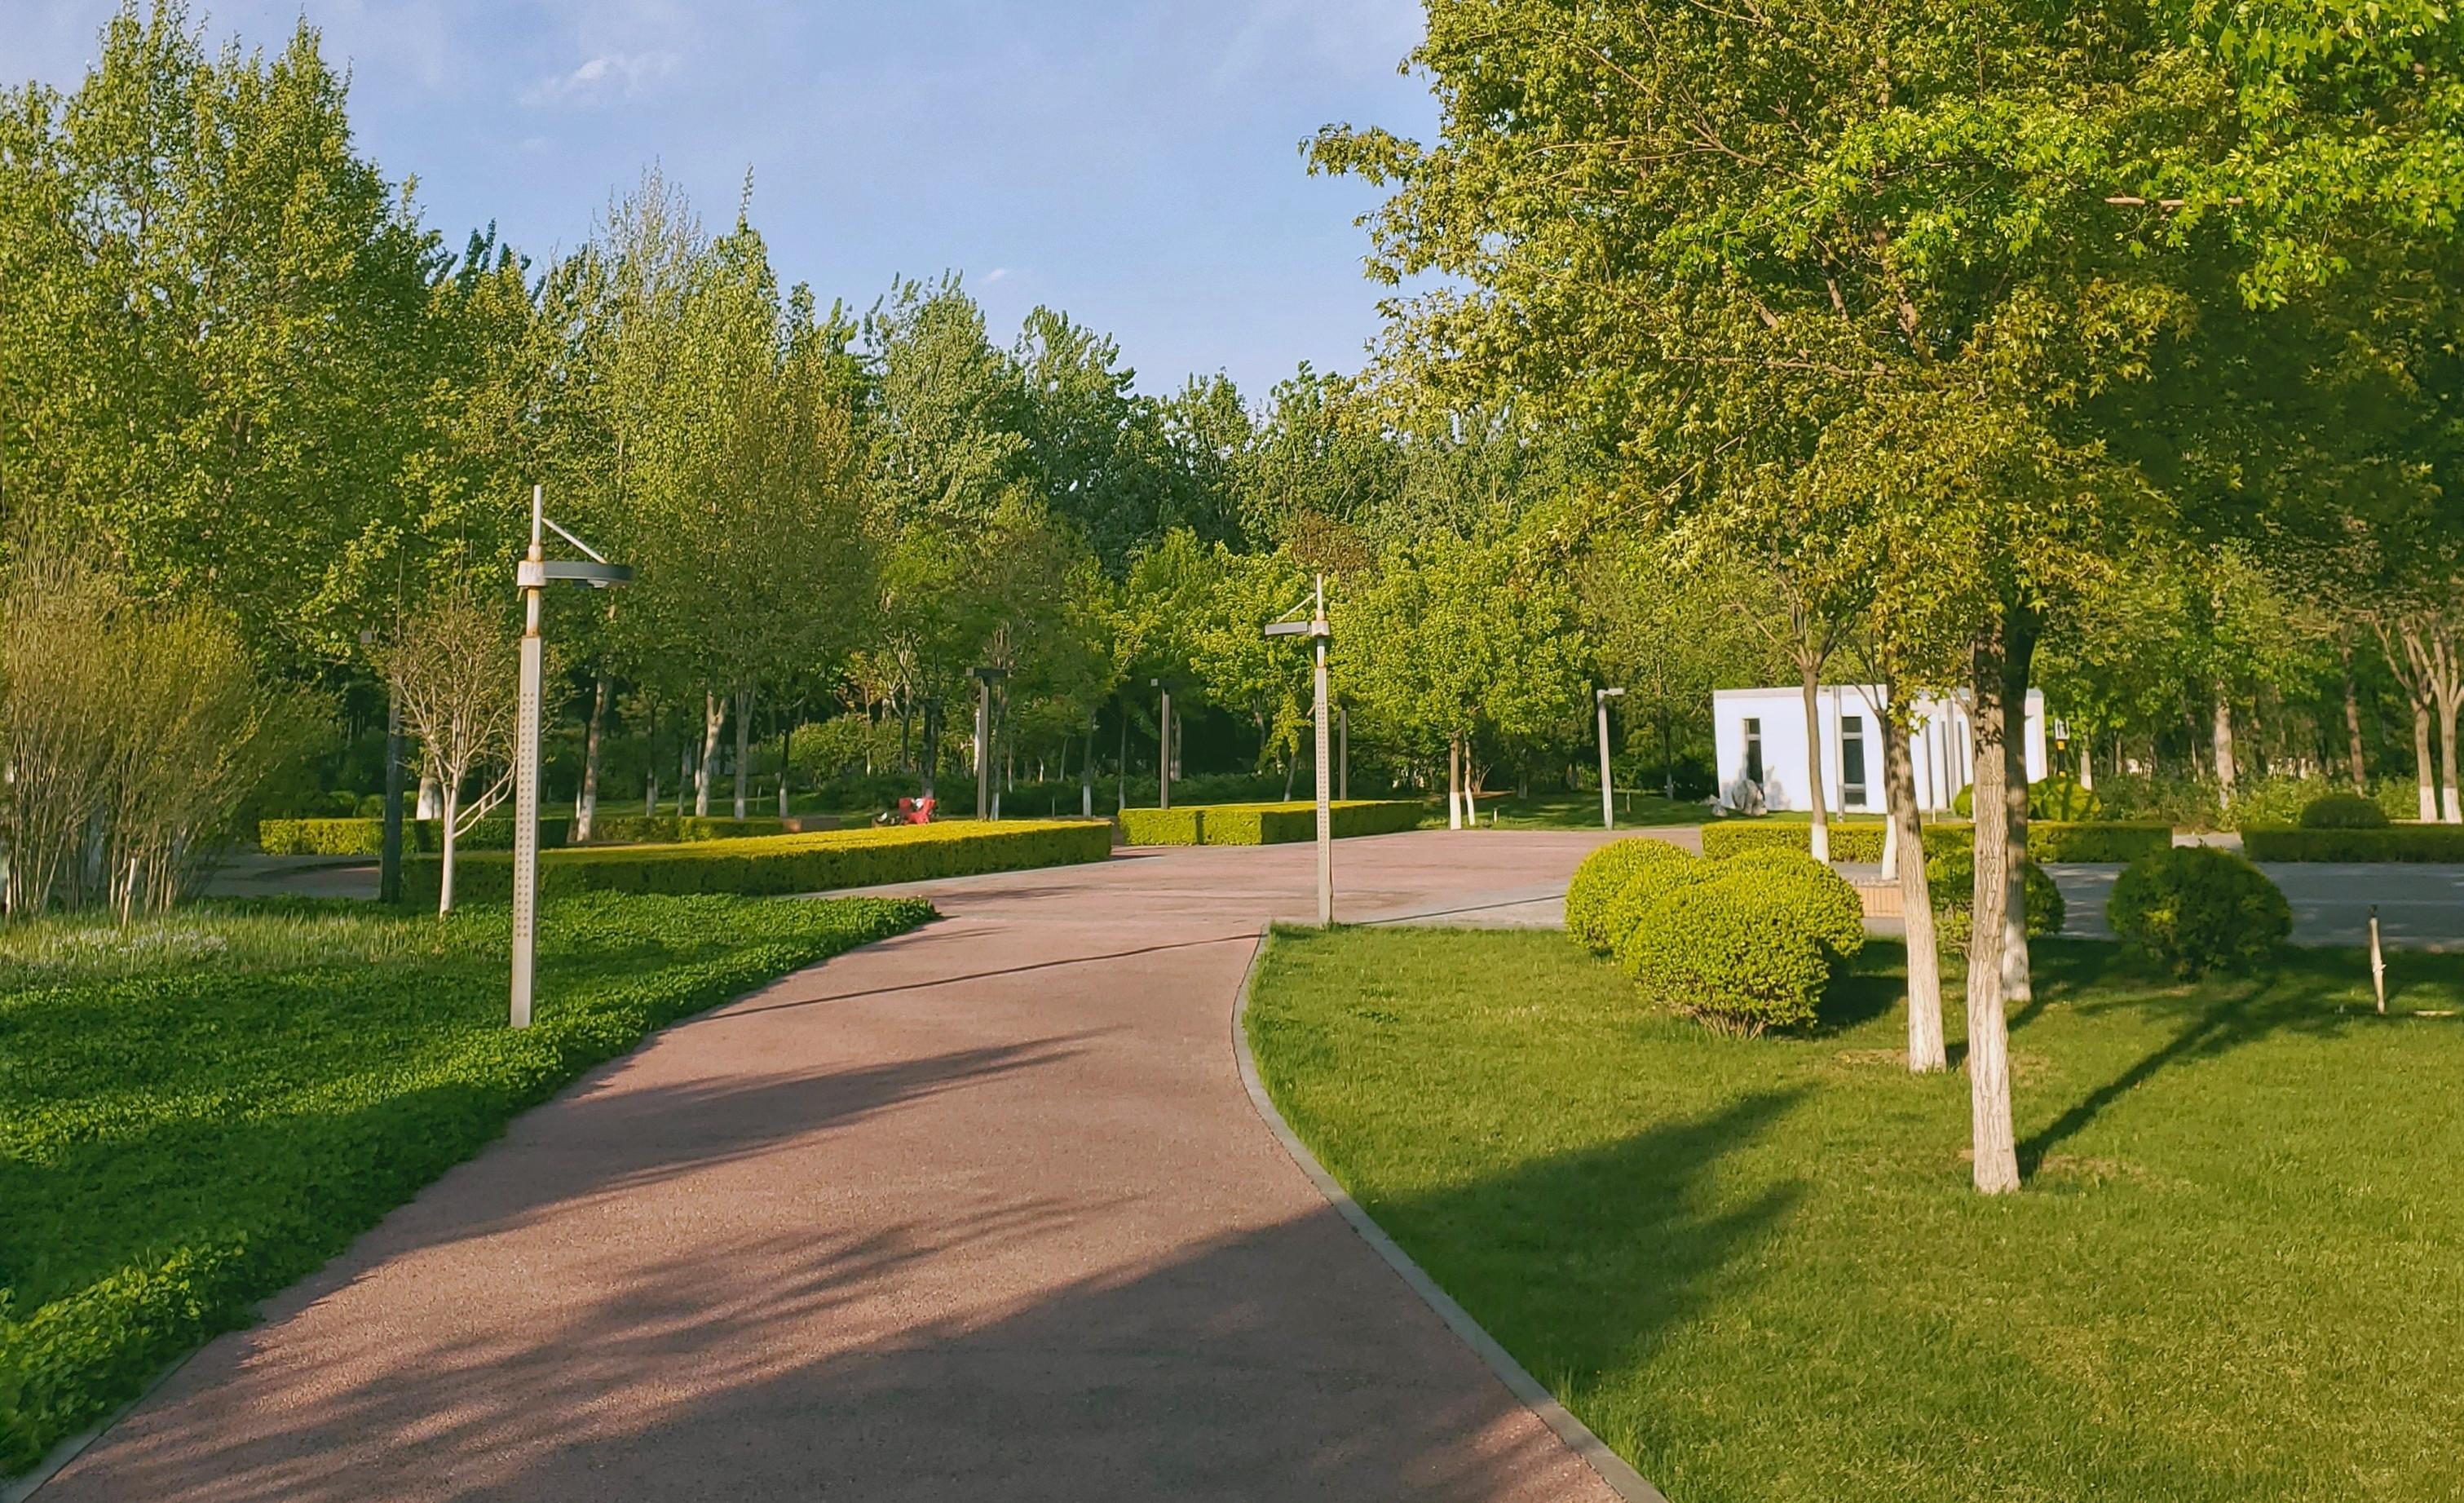 GalaxyS10+ 公园小景